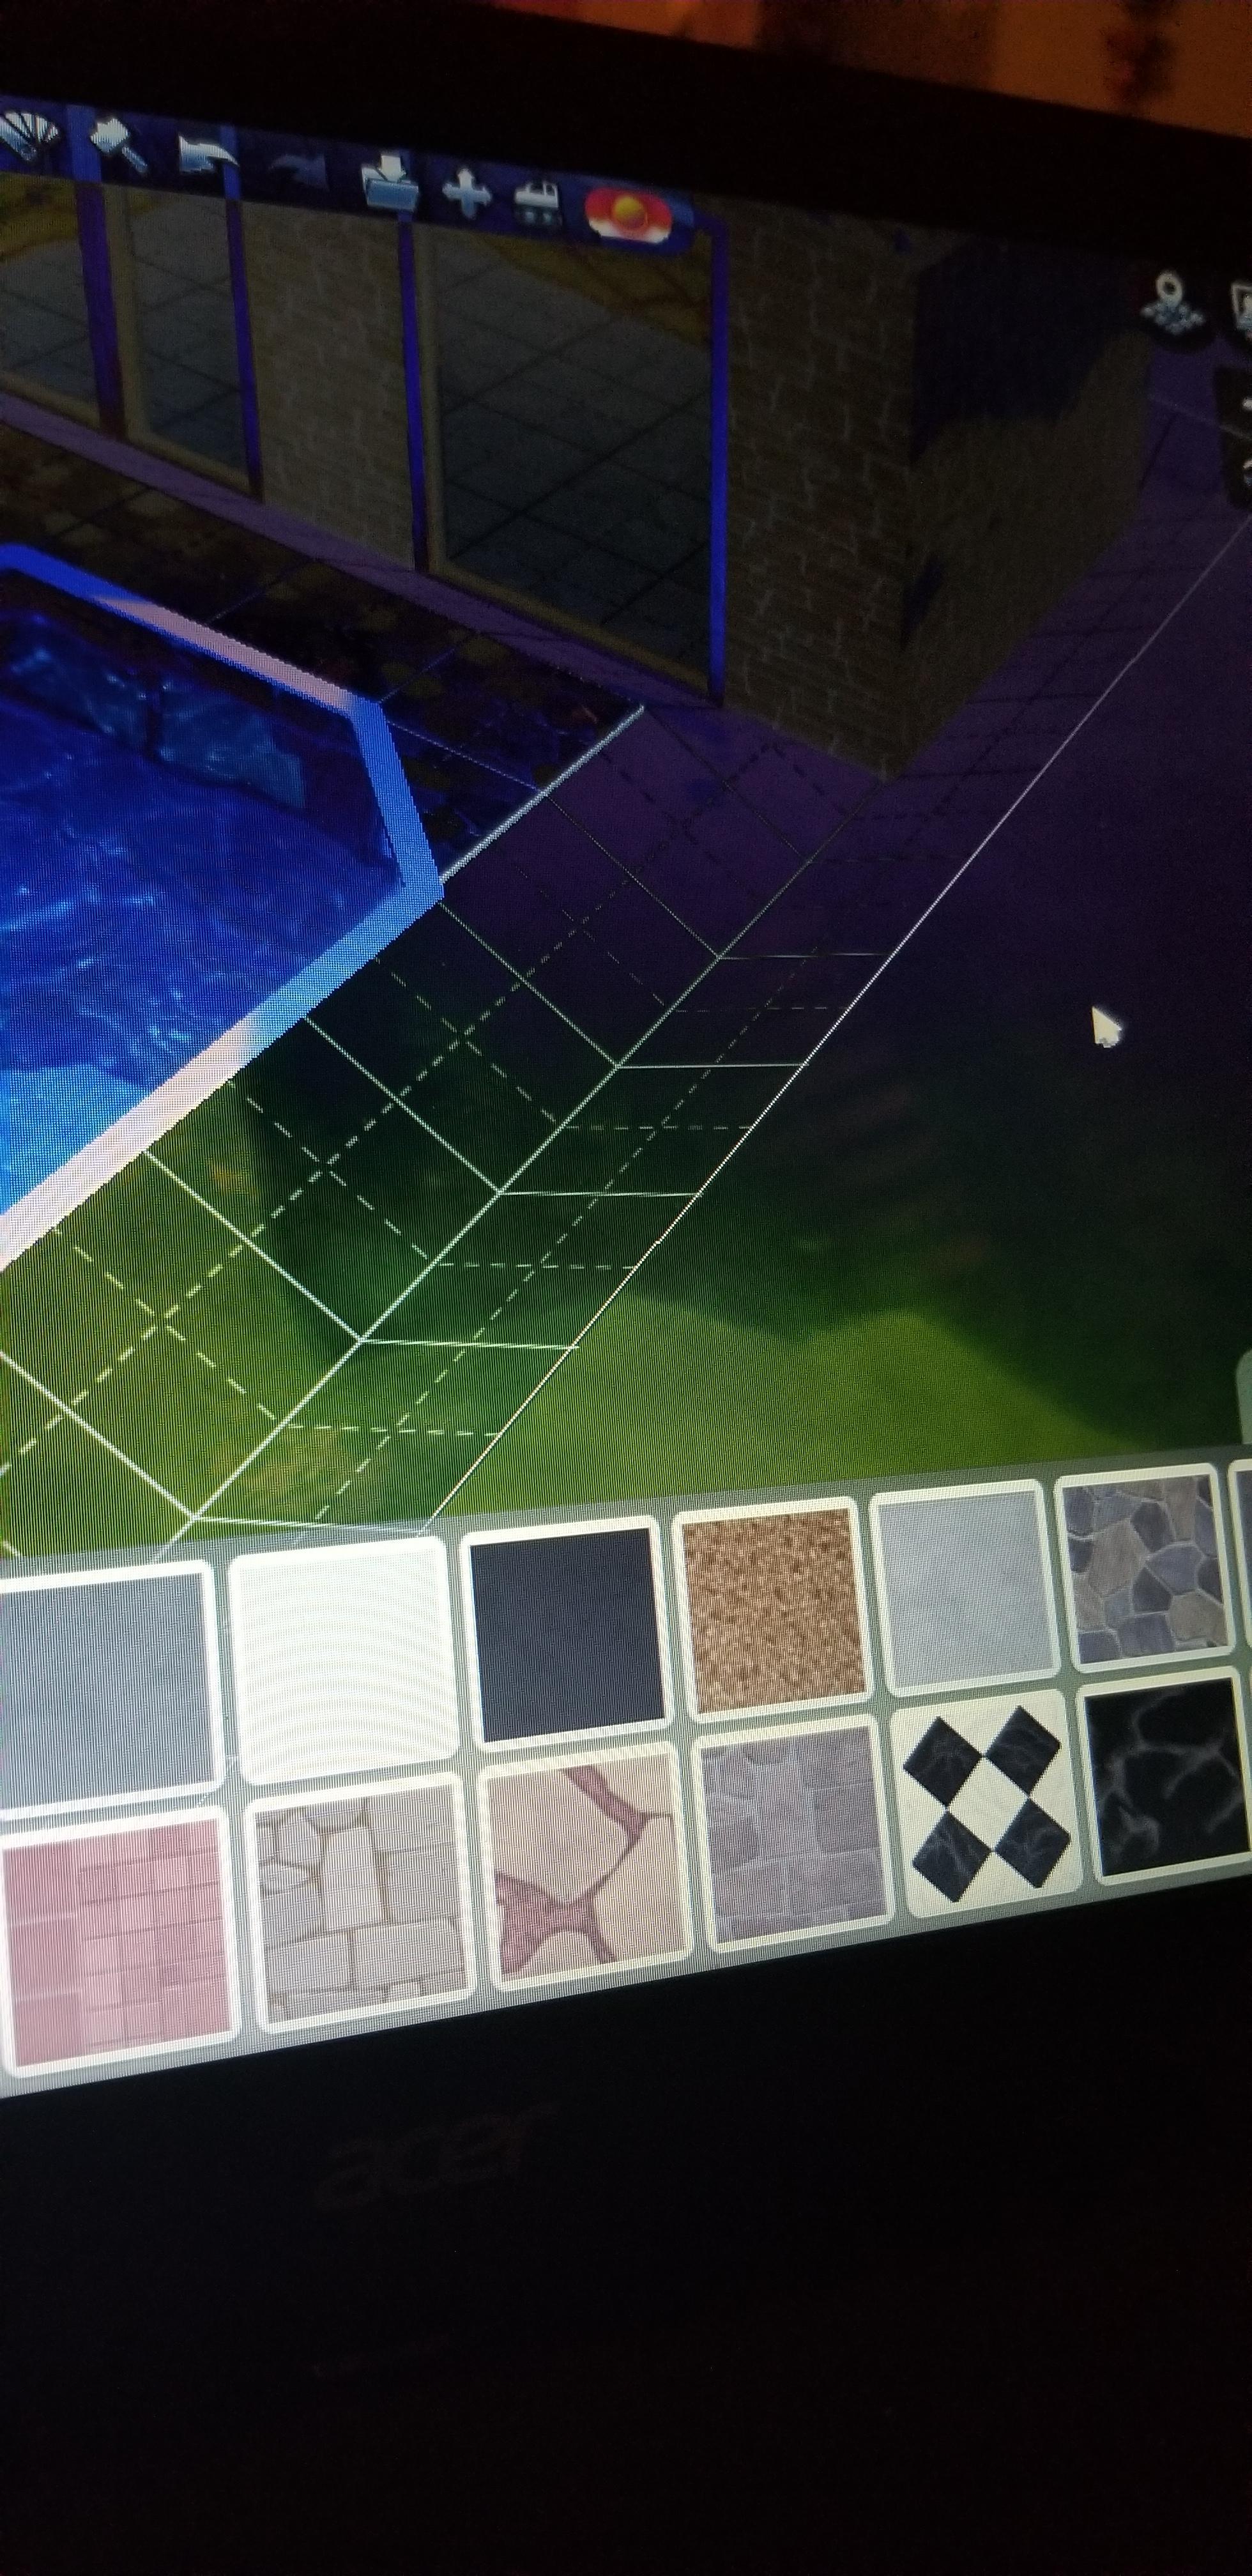 How To Make Basement Sims 4 : basement, Ground, Doing, Tried, Flatten, Terrain, Around, House., Can't, Basement., Help?, Sims4